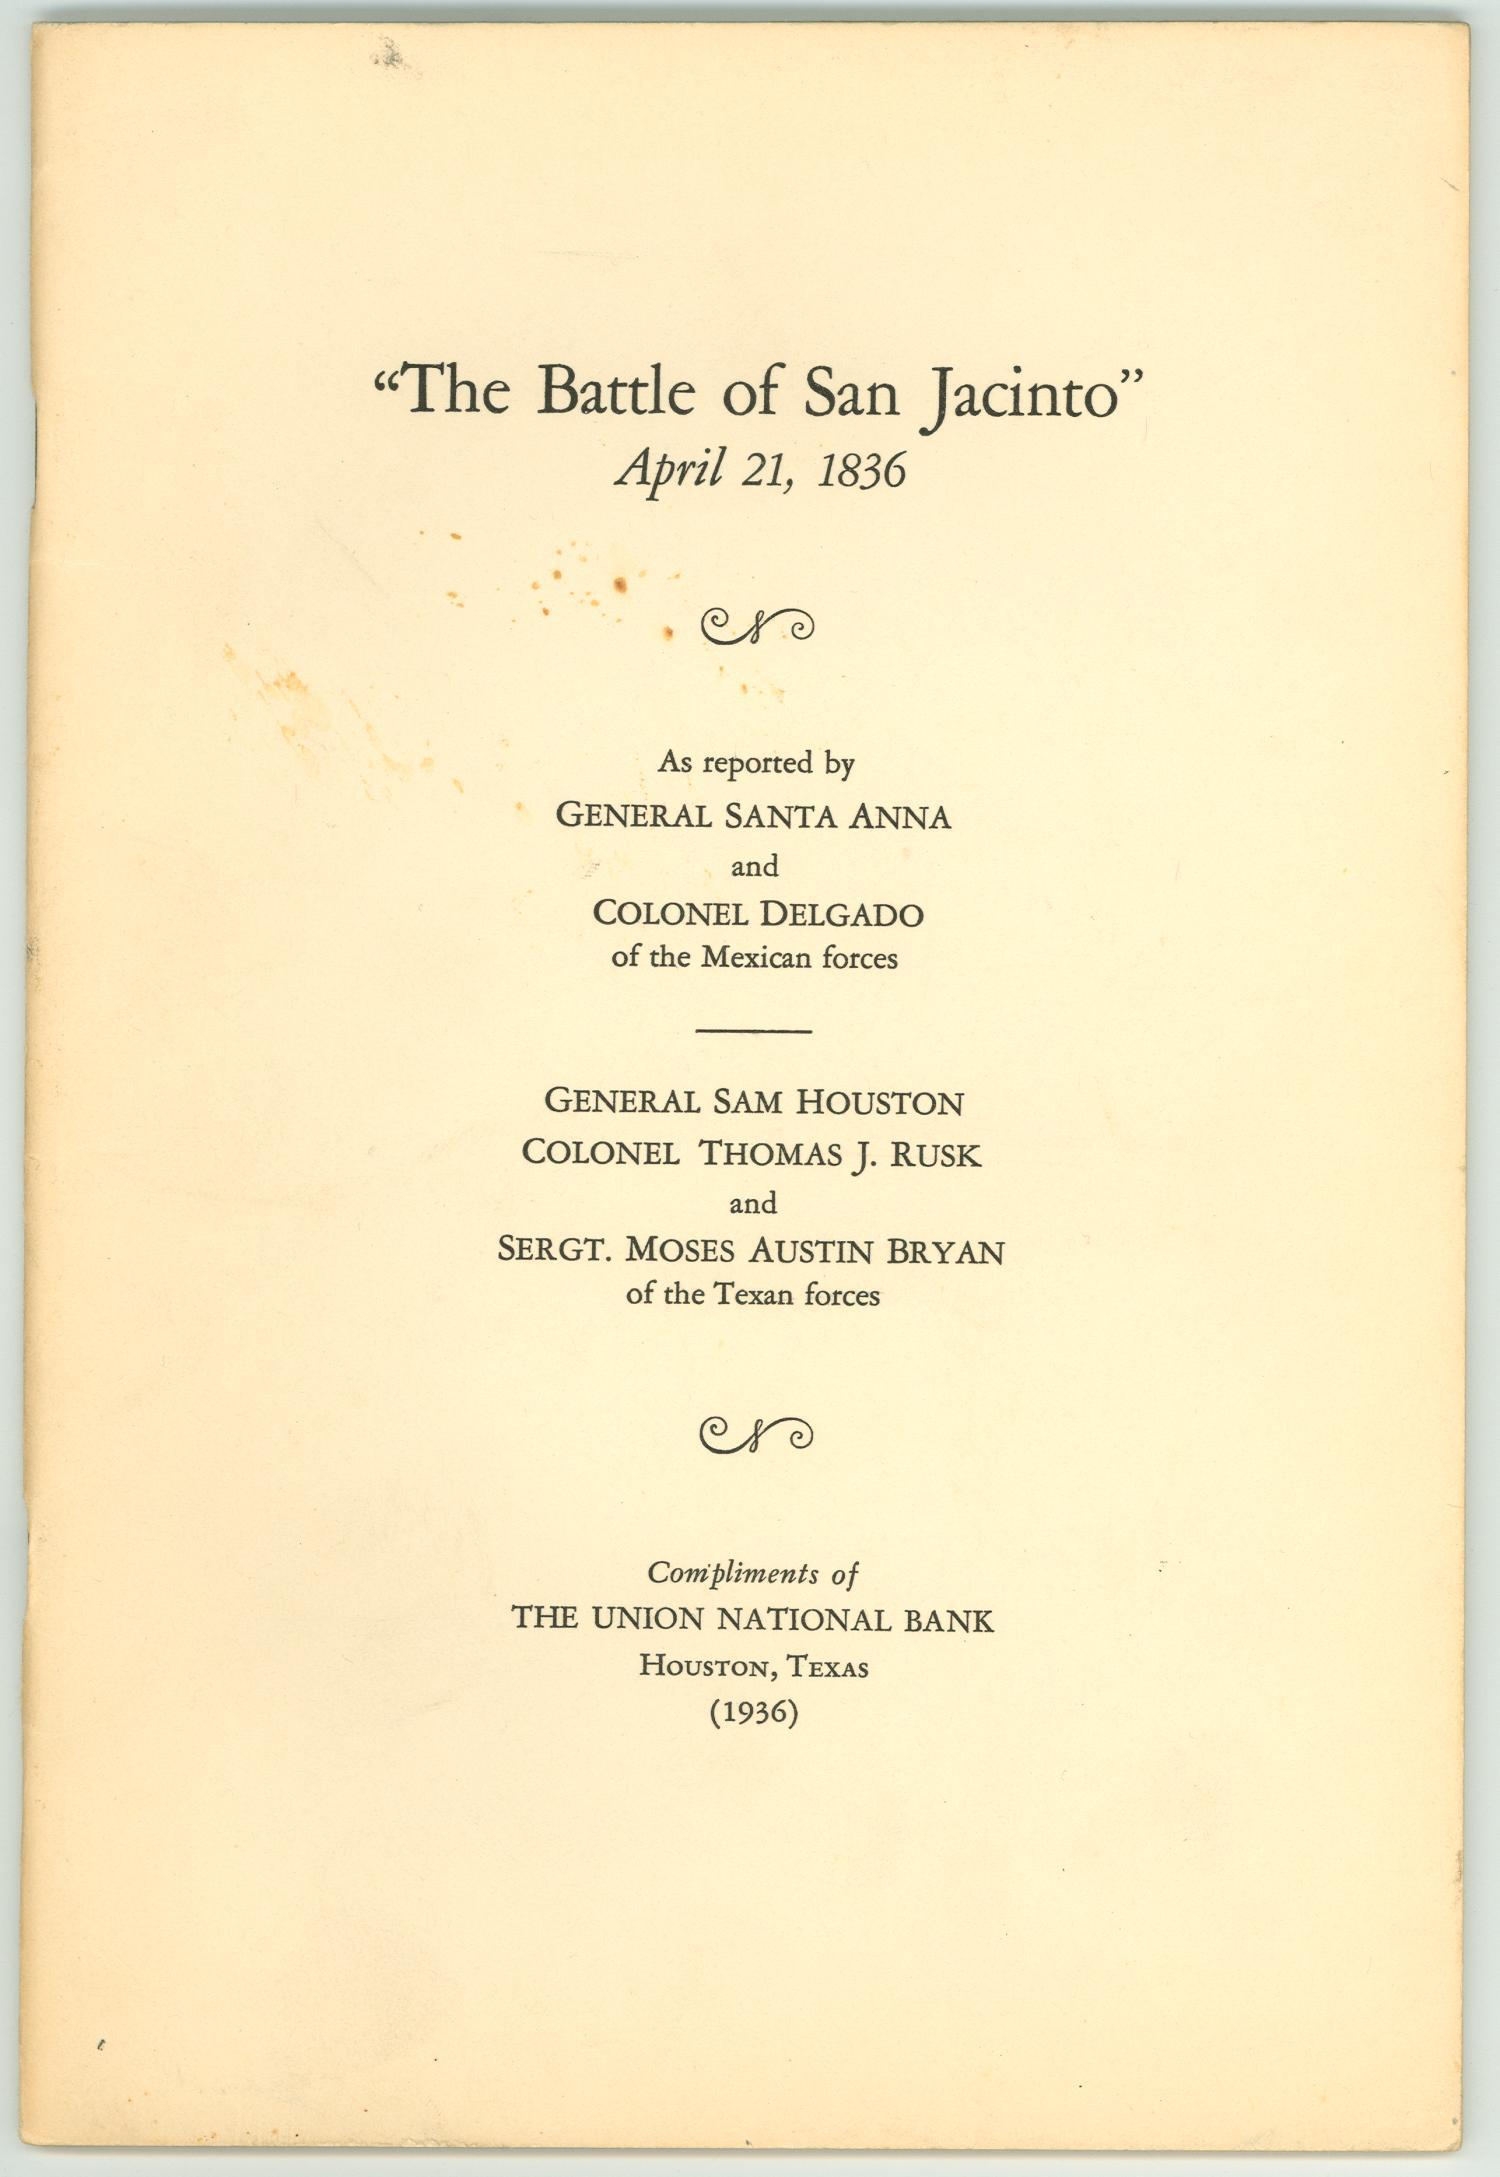 san jacinto hindu single women 5 facts on how texas began san jacinto monument travel tips for single women to travel austin city.